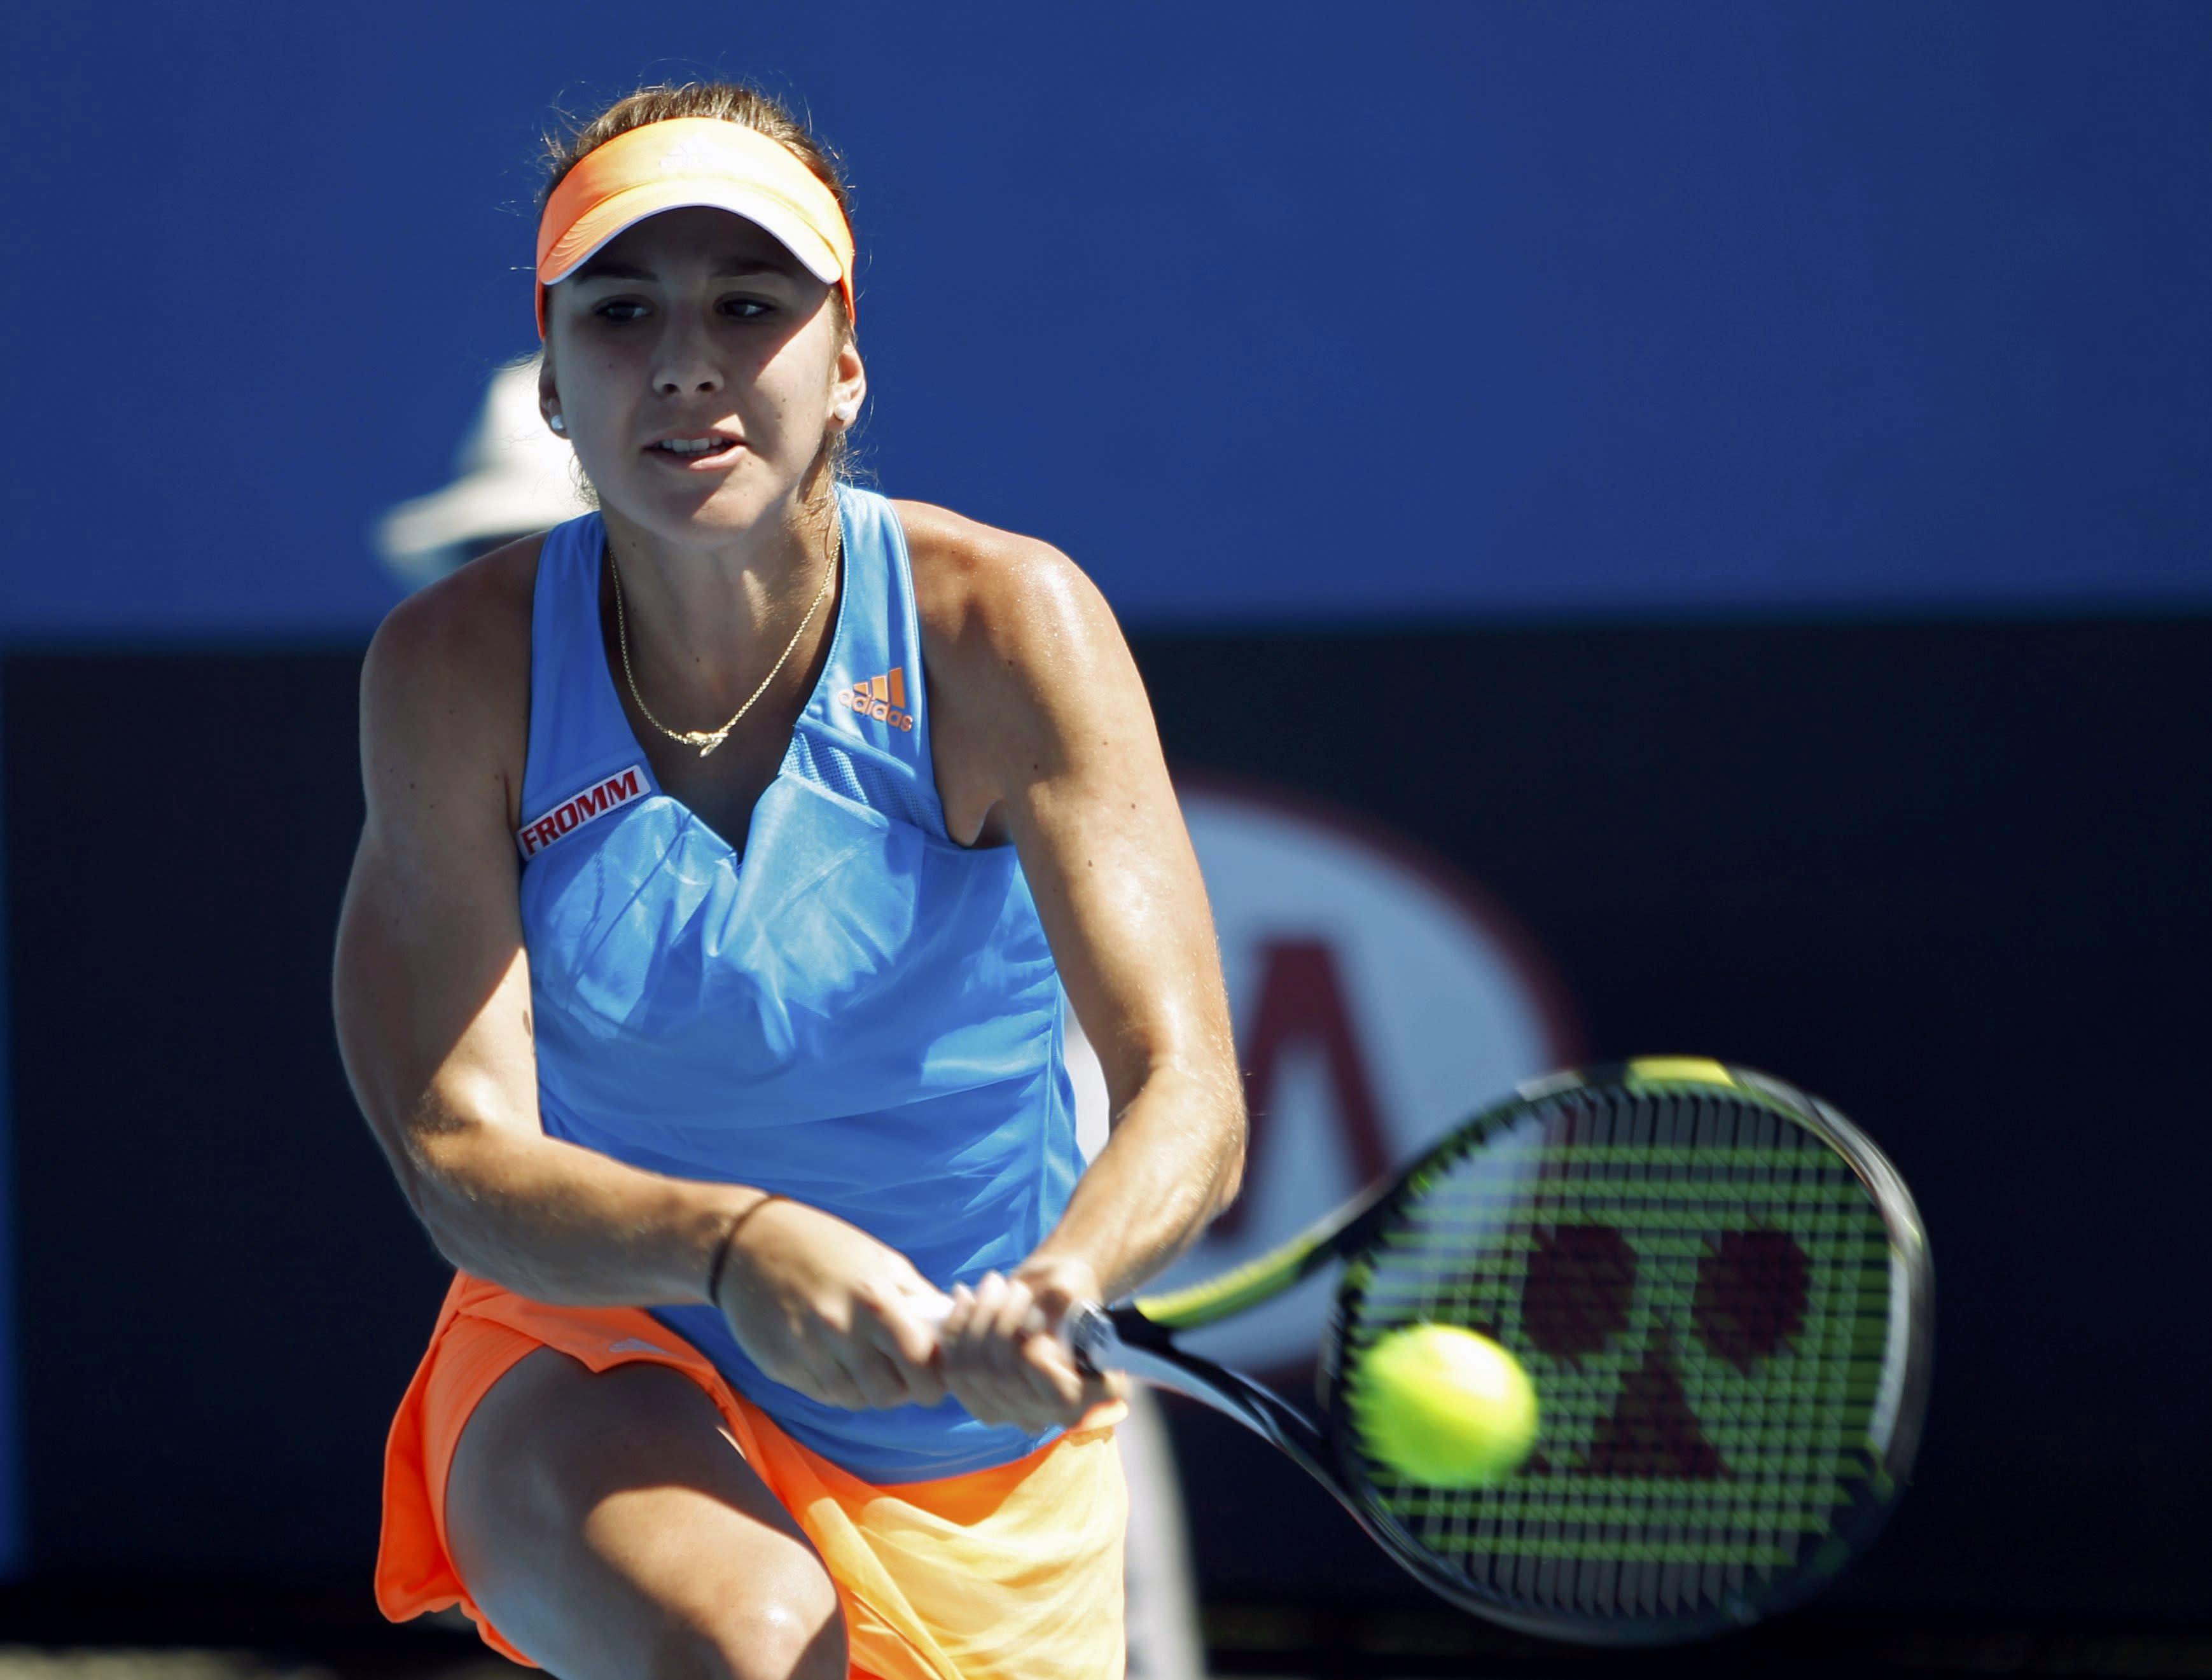 Us open tennis dates in Sydney